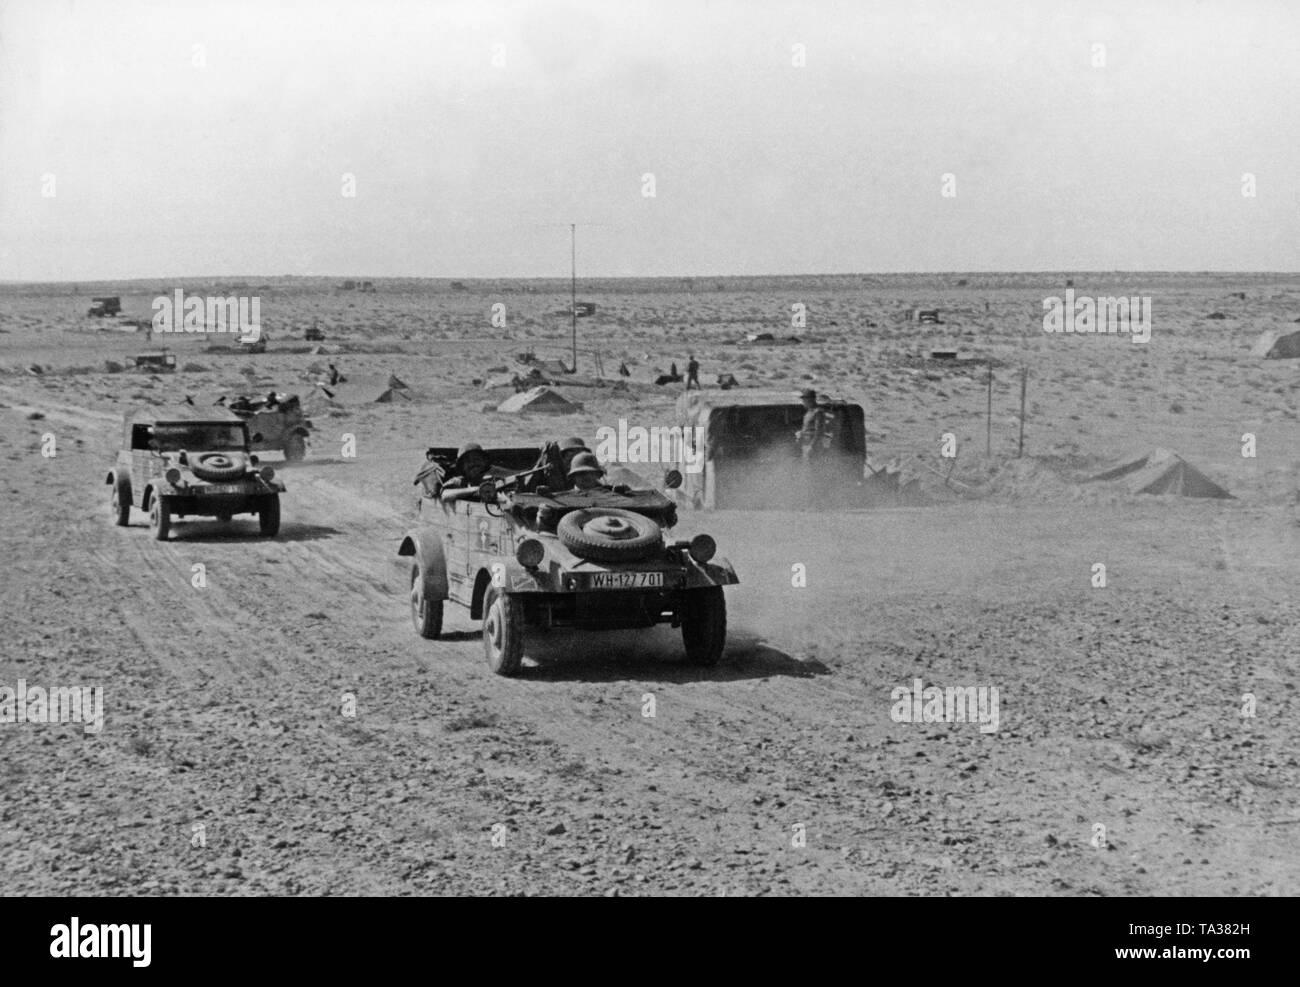 Three VW Kuebelwagen in a desert landscape in North Africa. - Stock Image